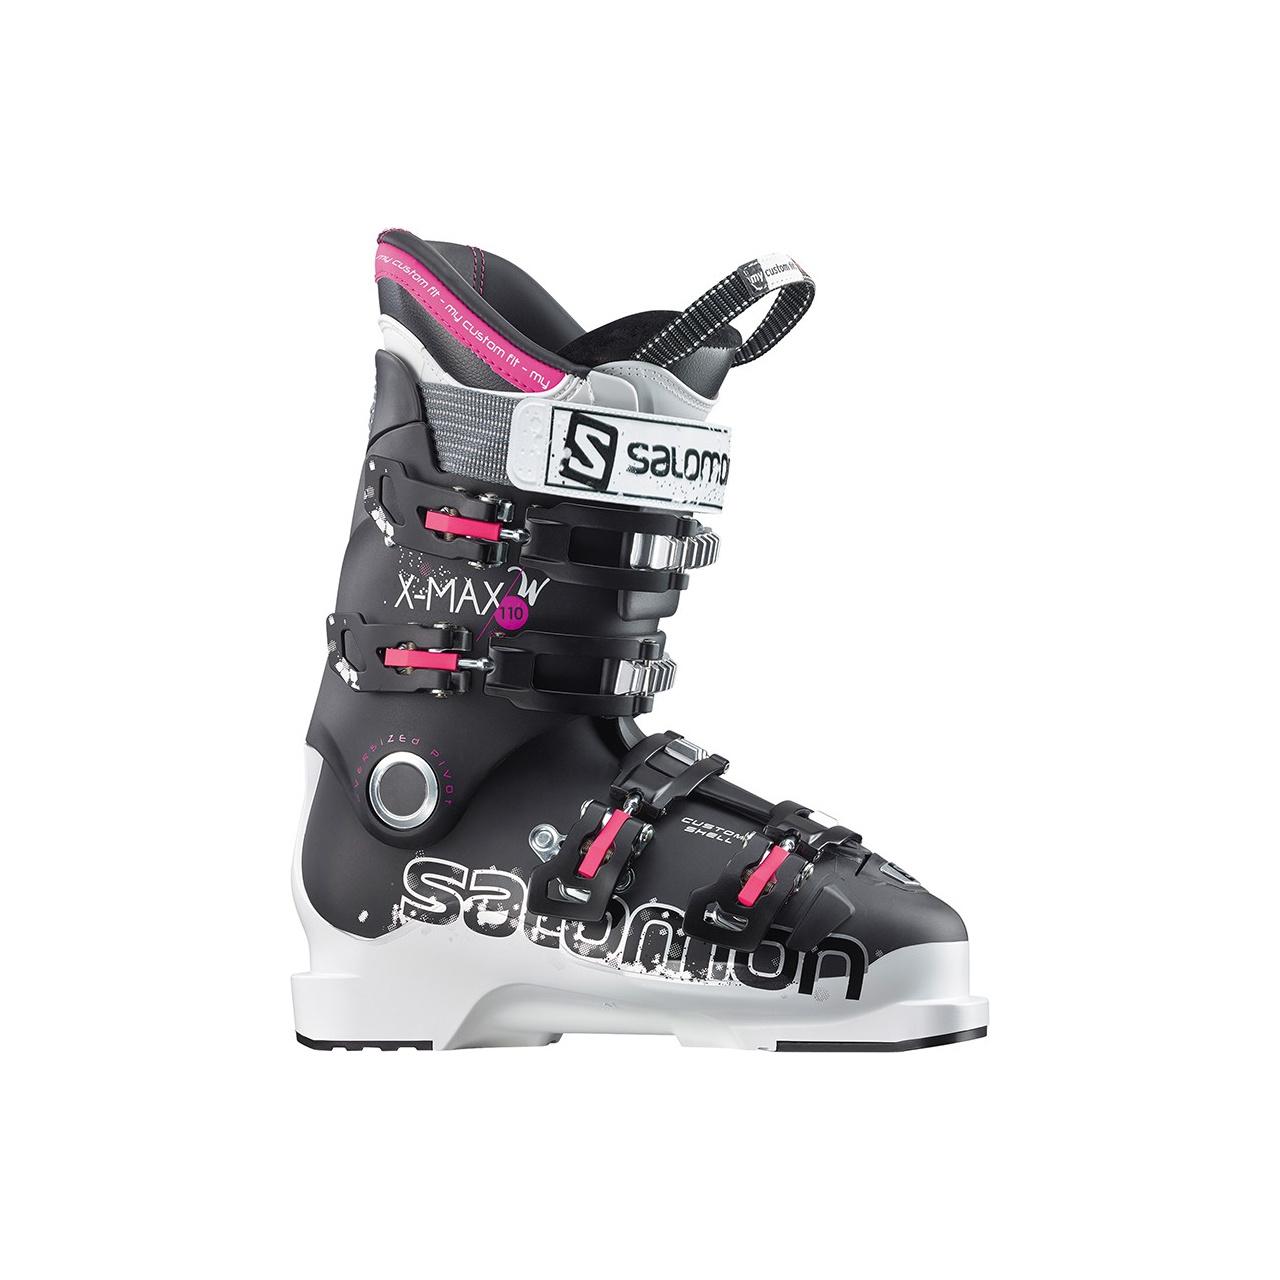 276460de656 sjezdové boty - salomon x max 110 w 15